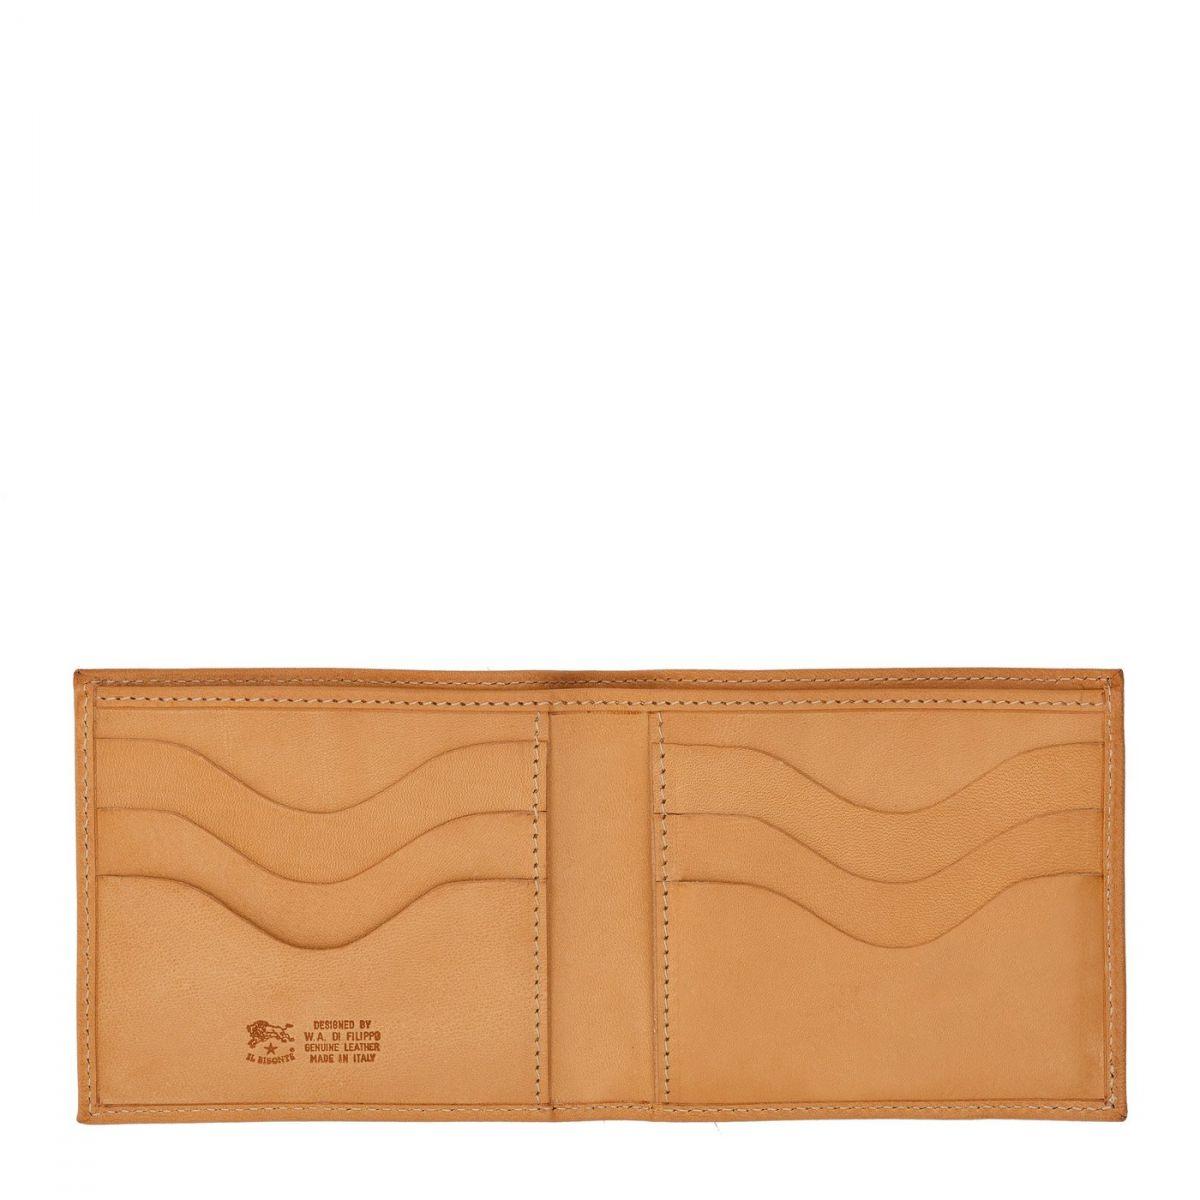 Men's Bi-Fold Wallet  in Cowhide Double Leather SBW029 color Natural | Details